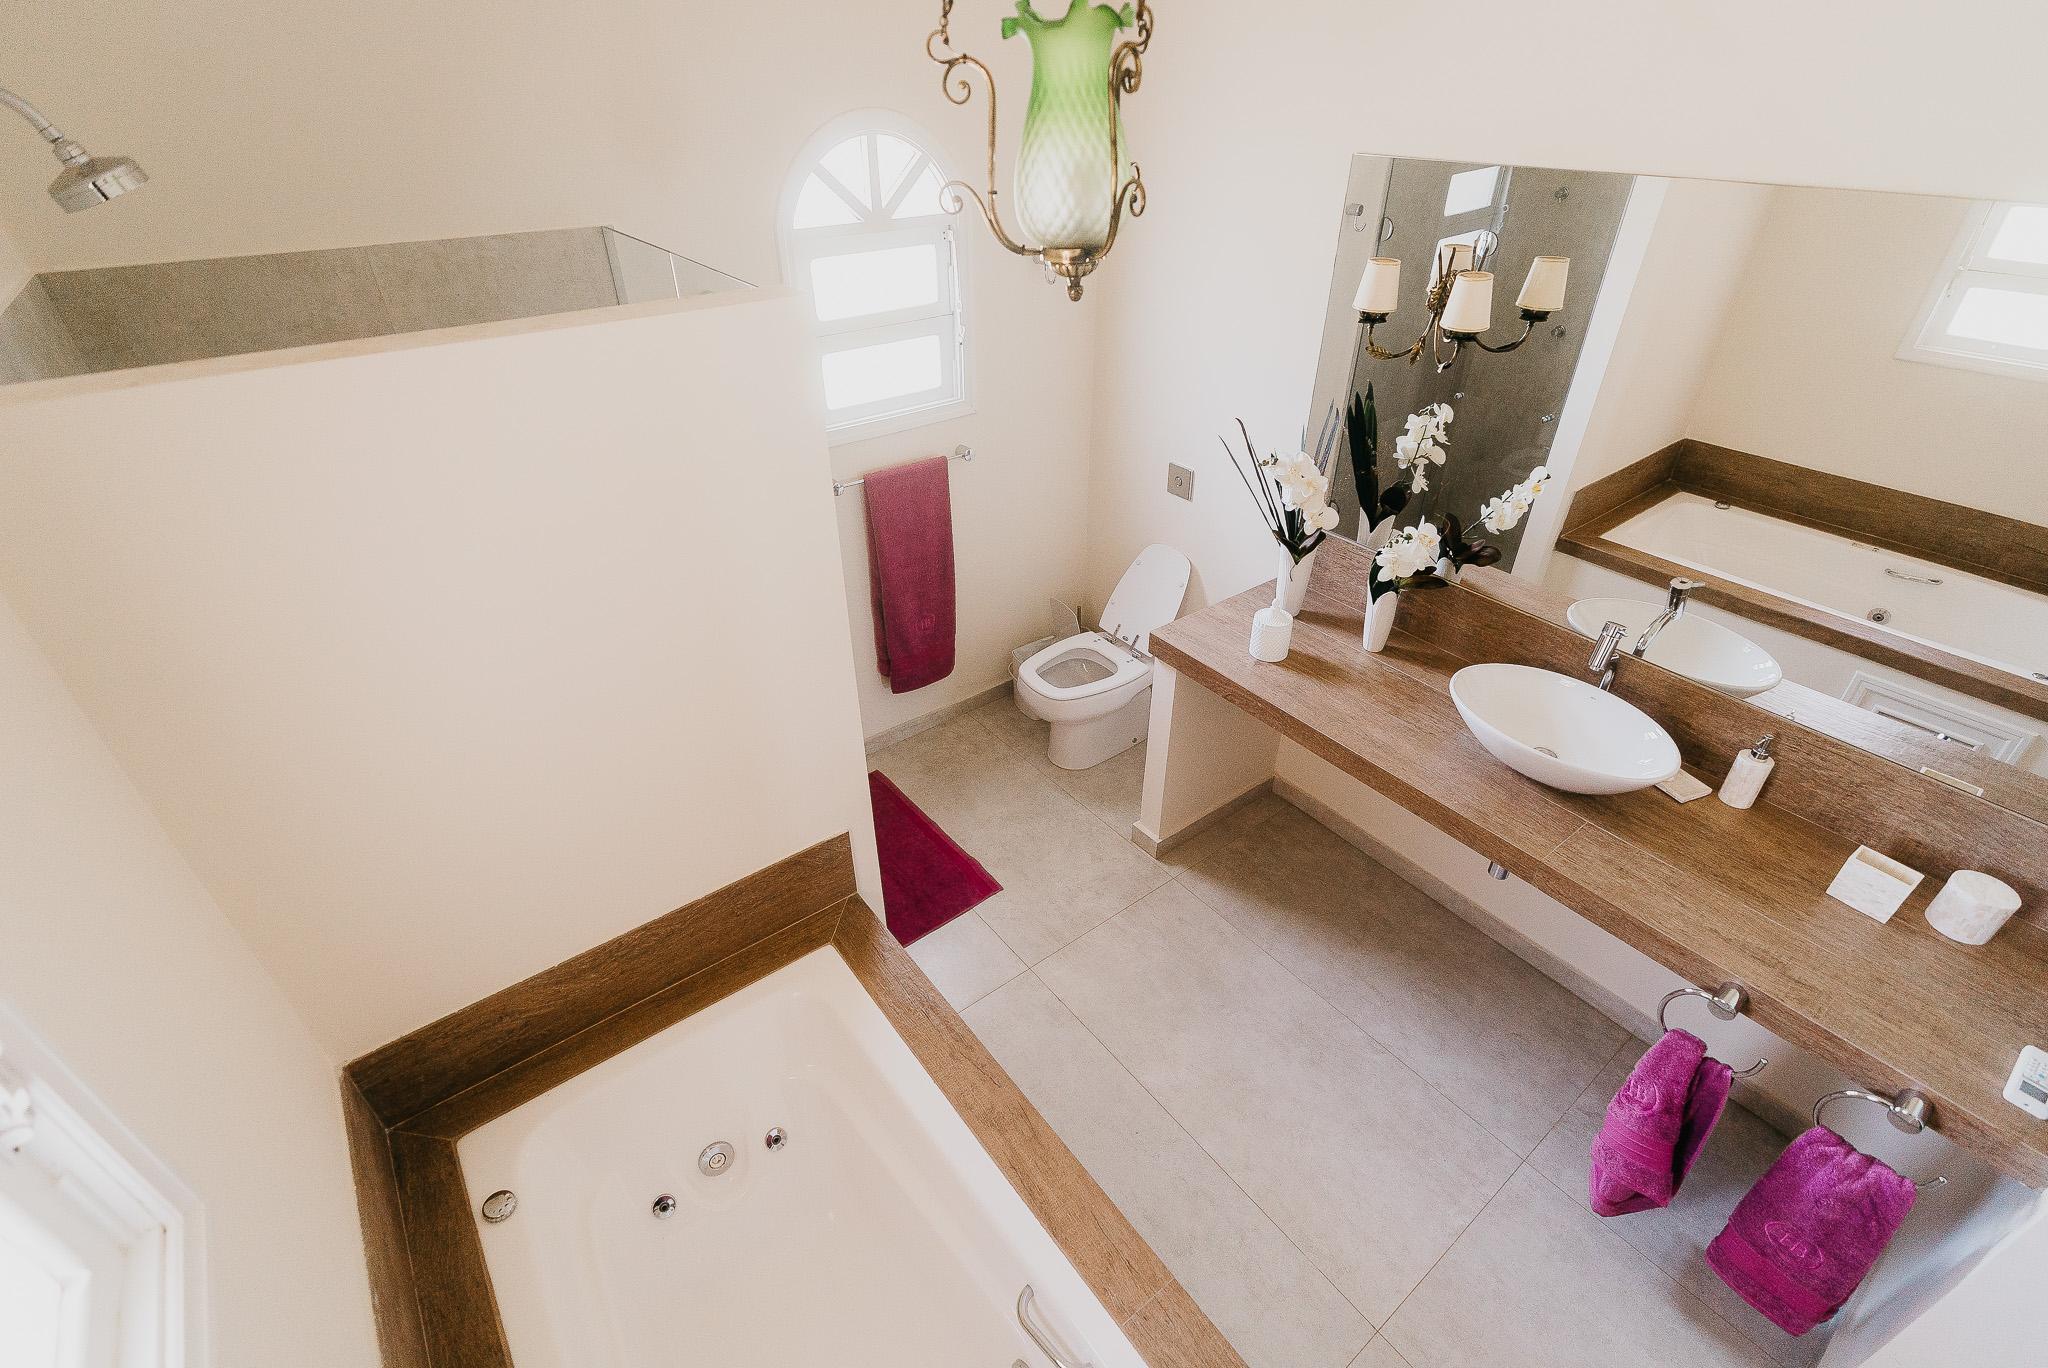 Banheiro Suíte I - Ângulo 1